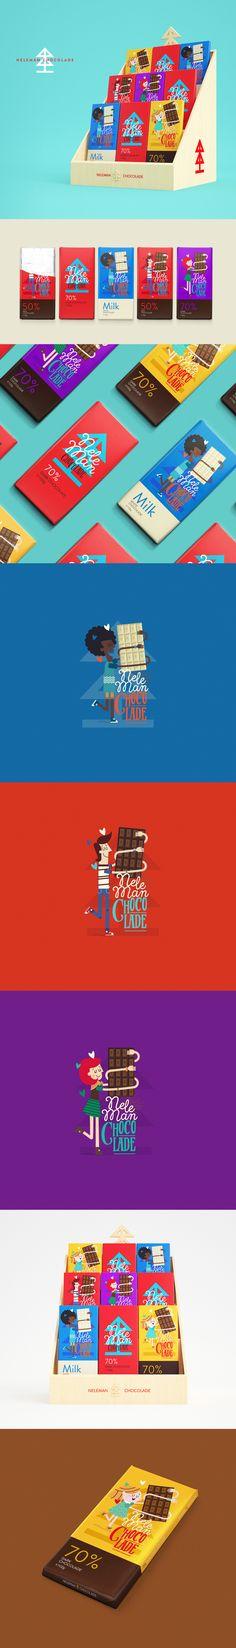 Neleman's Chocolade #brand #branding #illustration #swt #marca #embalagem #packaging